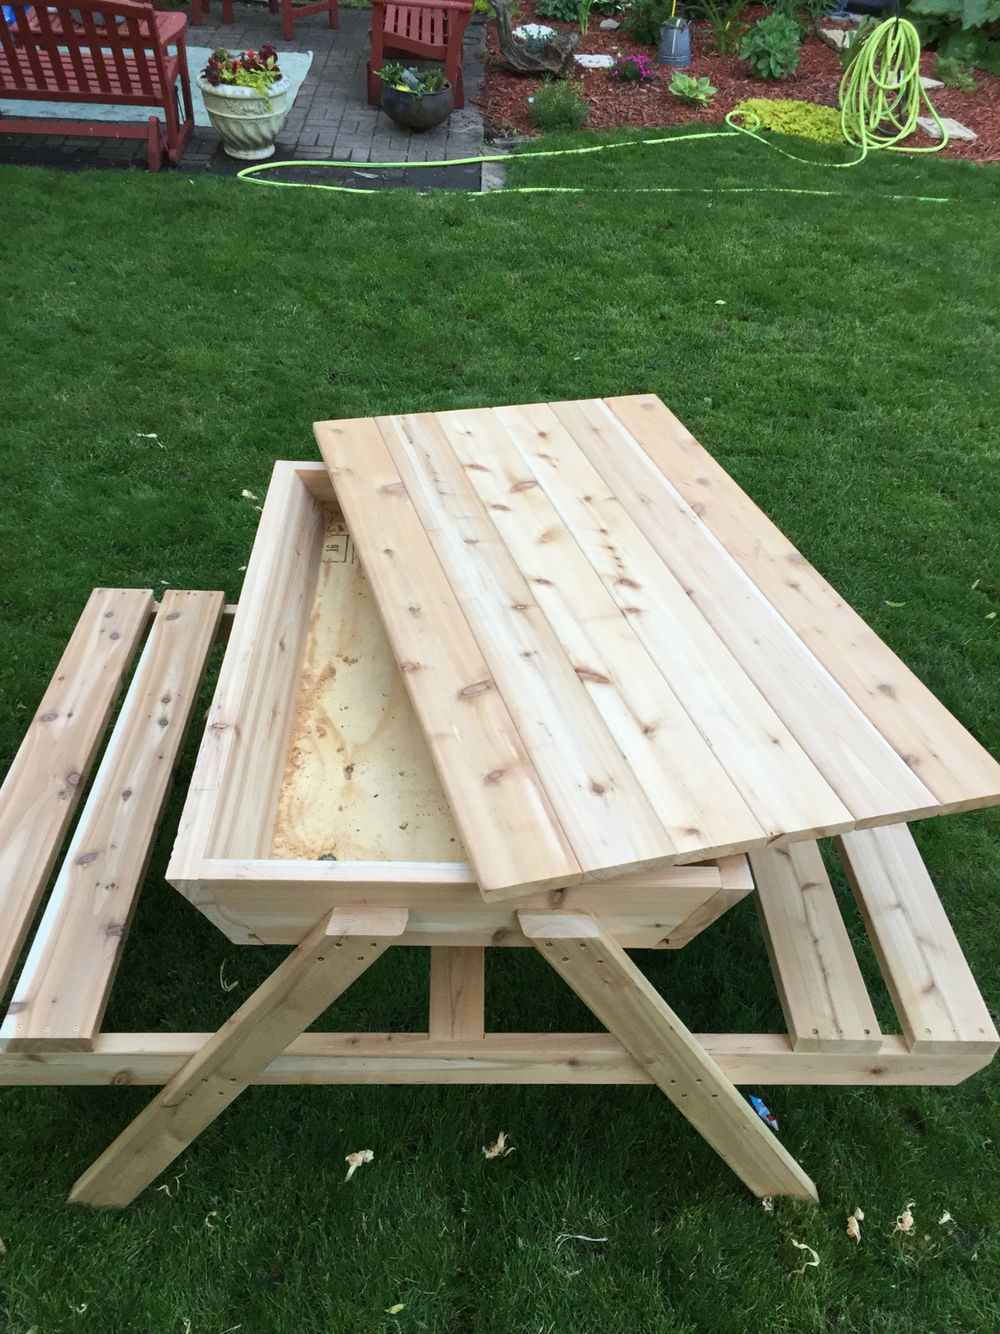 Kids Picnic Table Sand Box Cedar Picnic Table Ice Chest